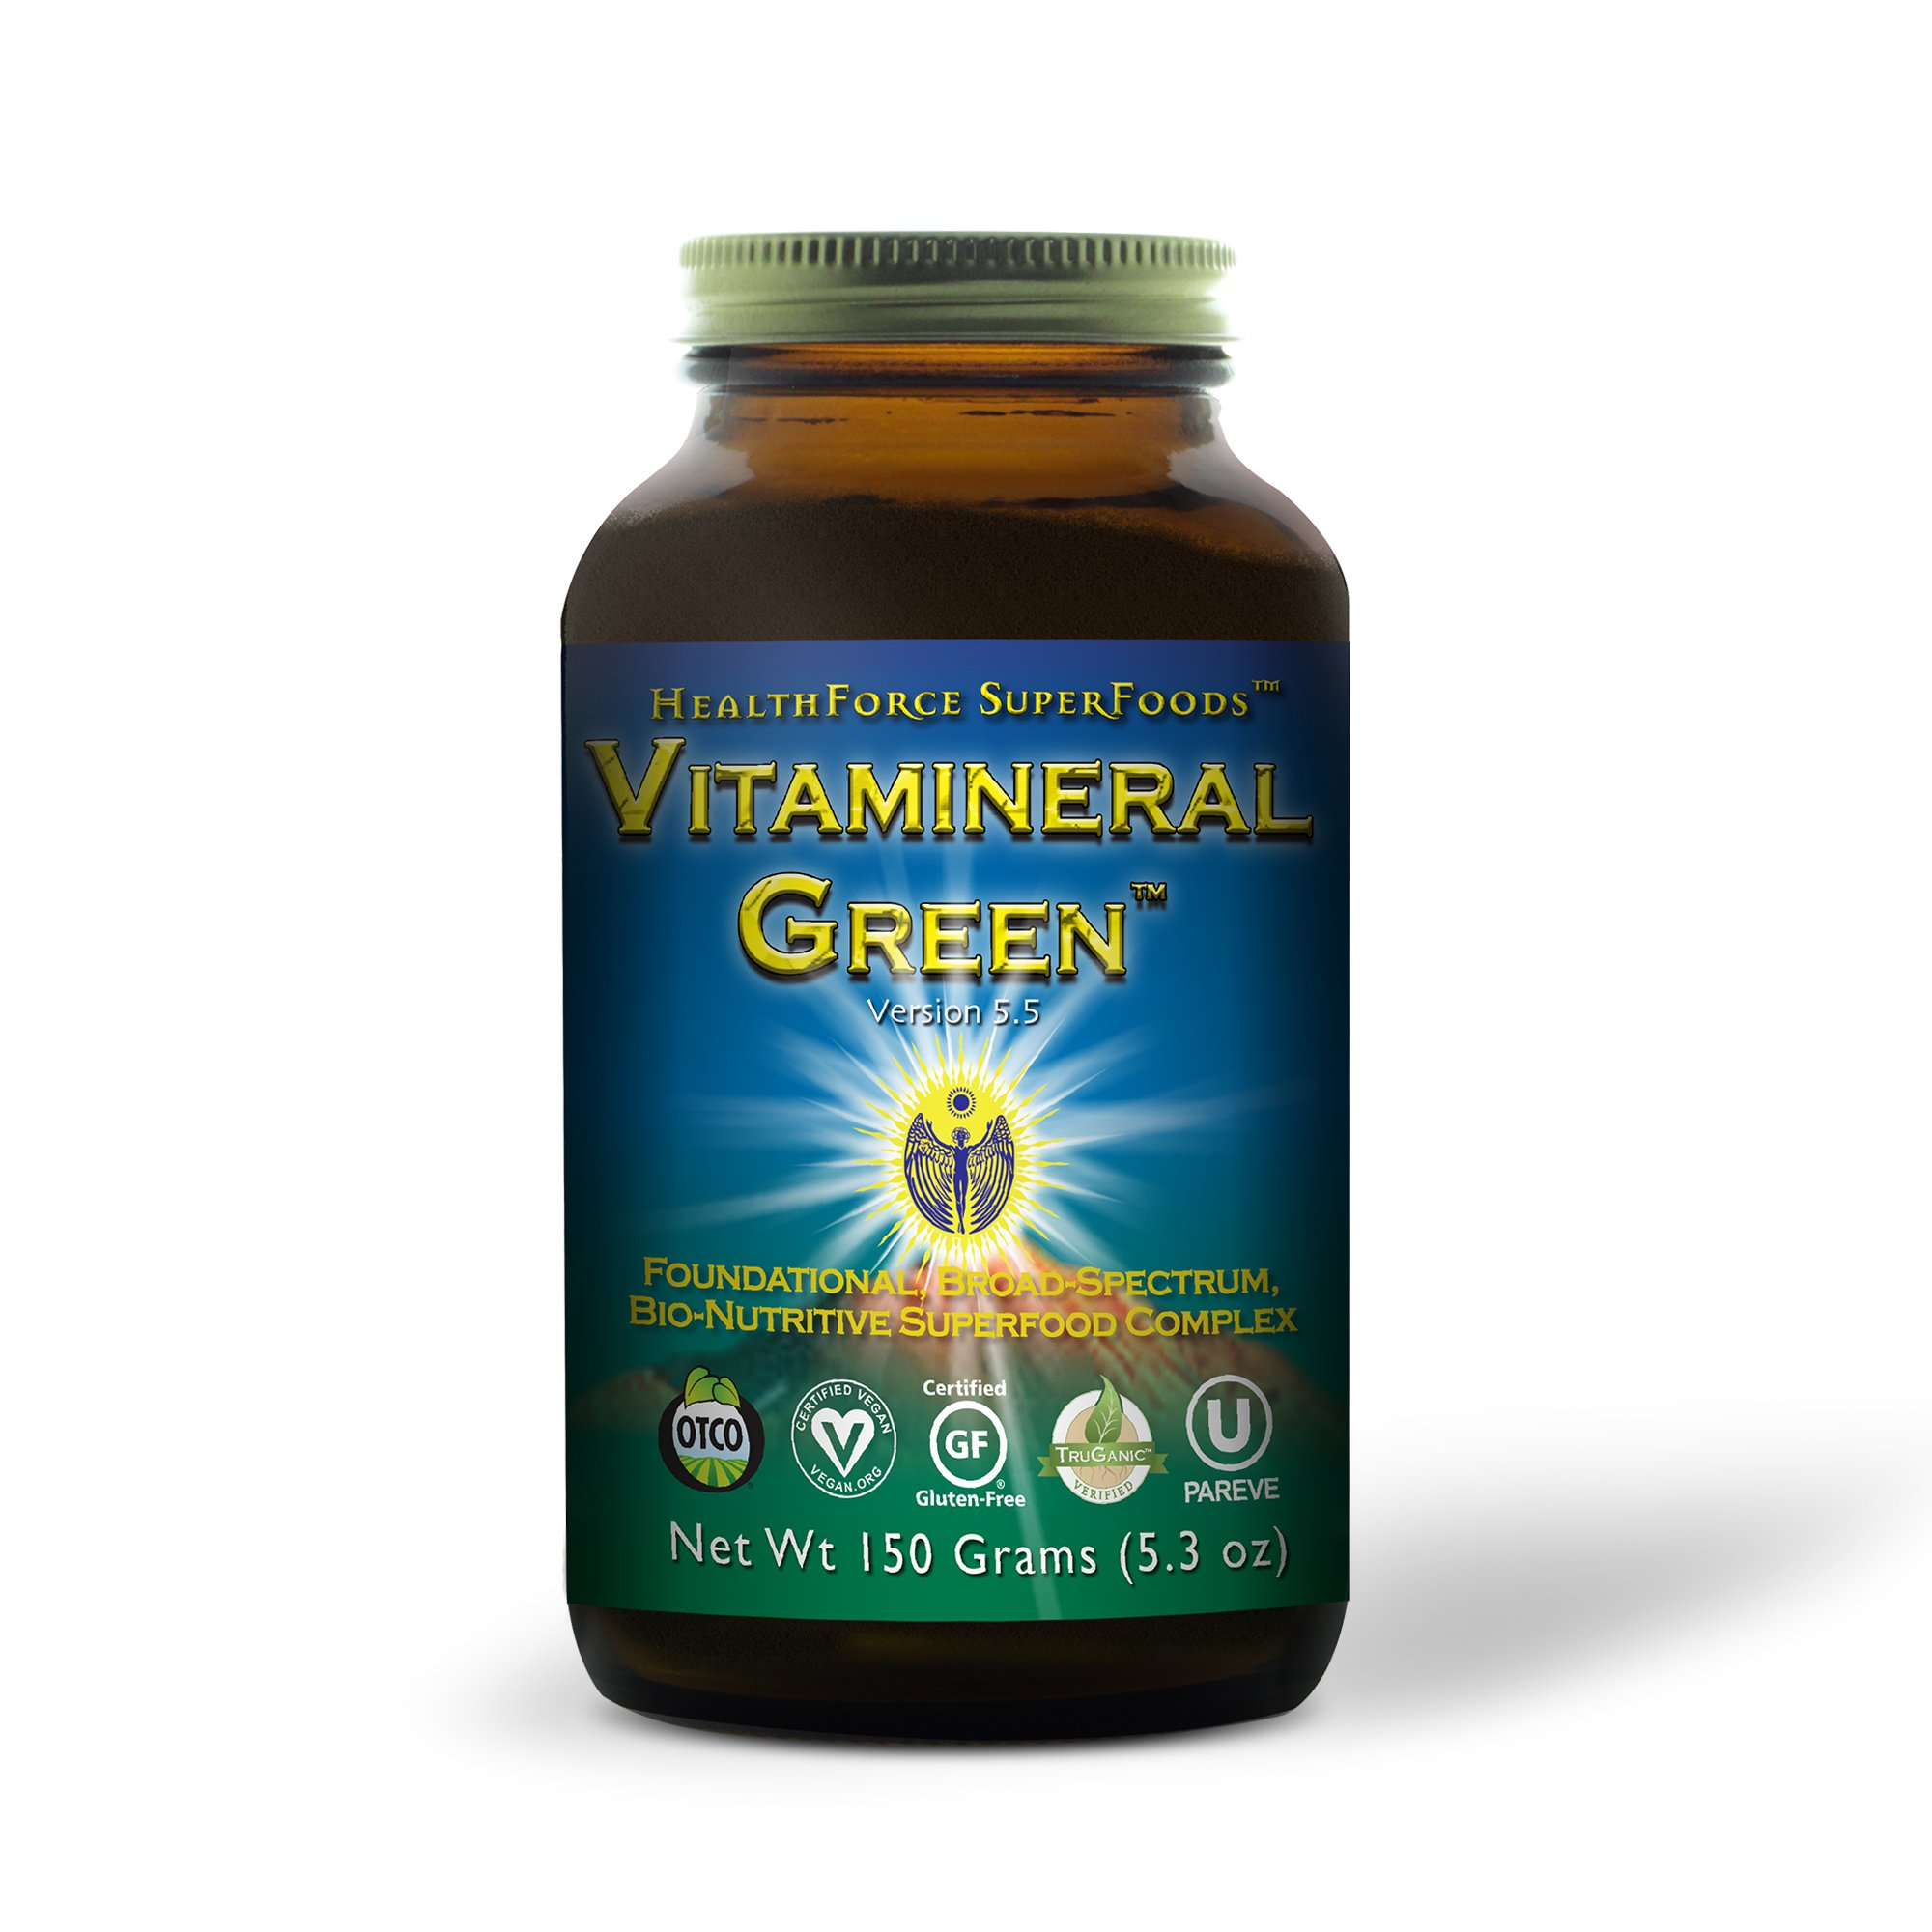 HealthForce SuperFoods Vitamineral Green, Superfood Complex, Vitamins, Minerals, Amino Acids (Protein), Antioxidants, Fibers, All-Natural, Organic, Non-GMO, Vegan, 150 Grams Powder